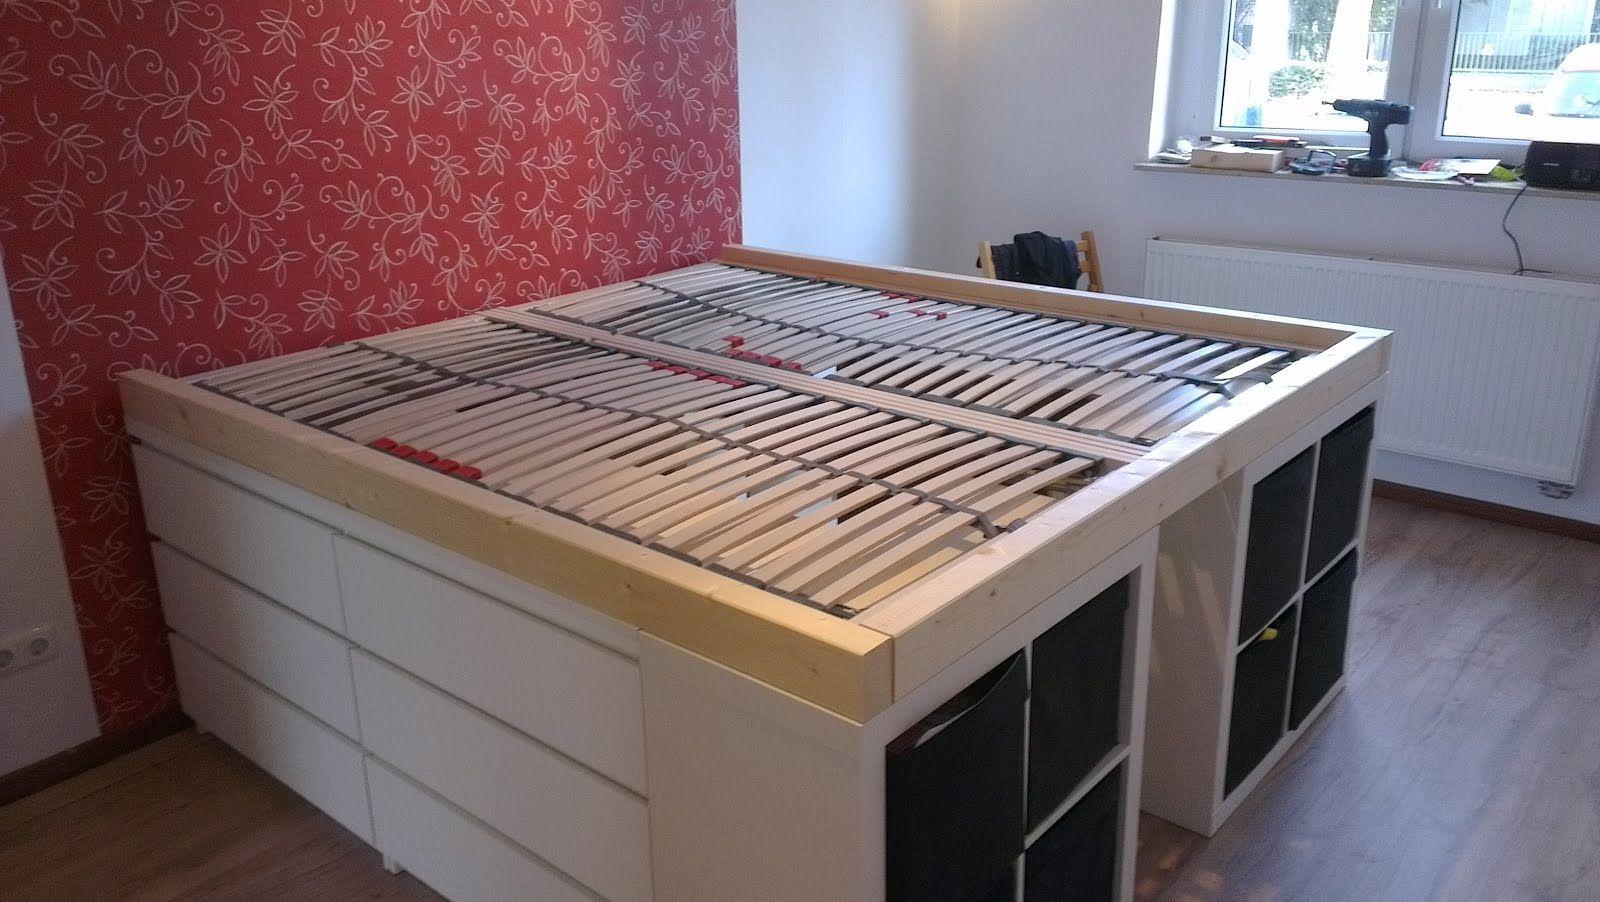 Half A Loft Bed Ikea Bett Hack Ikea Diy Schlafzimmer Diy